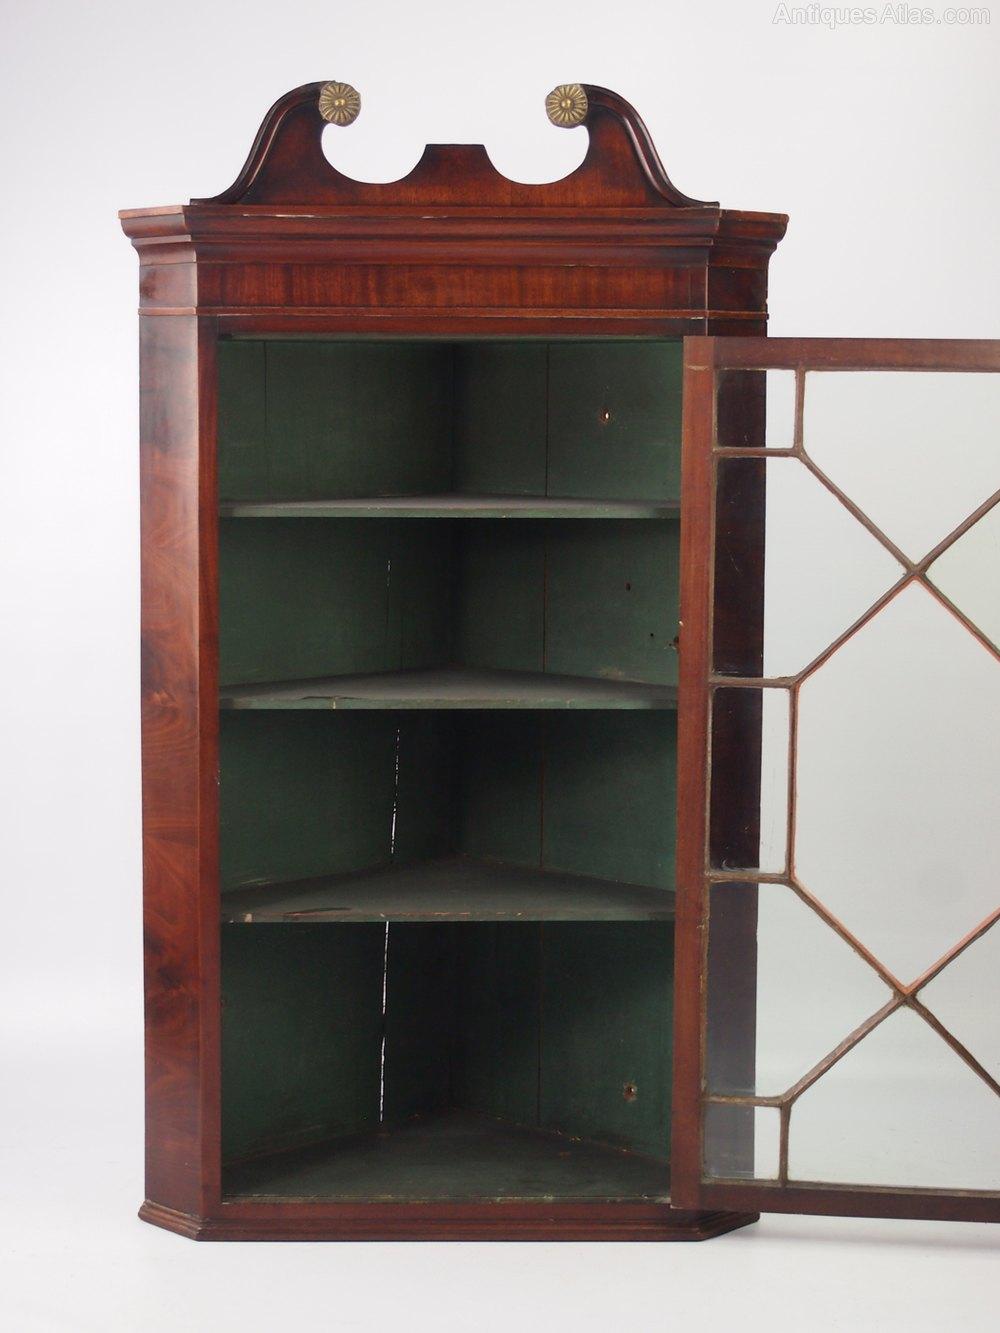 Georgian Mahogany Corner Cupboard Display Cabinet Antique Corner Cabinets  ... - Georgian Mahogany Corner Cupboard Display Cabinet - Antiques Atlas